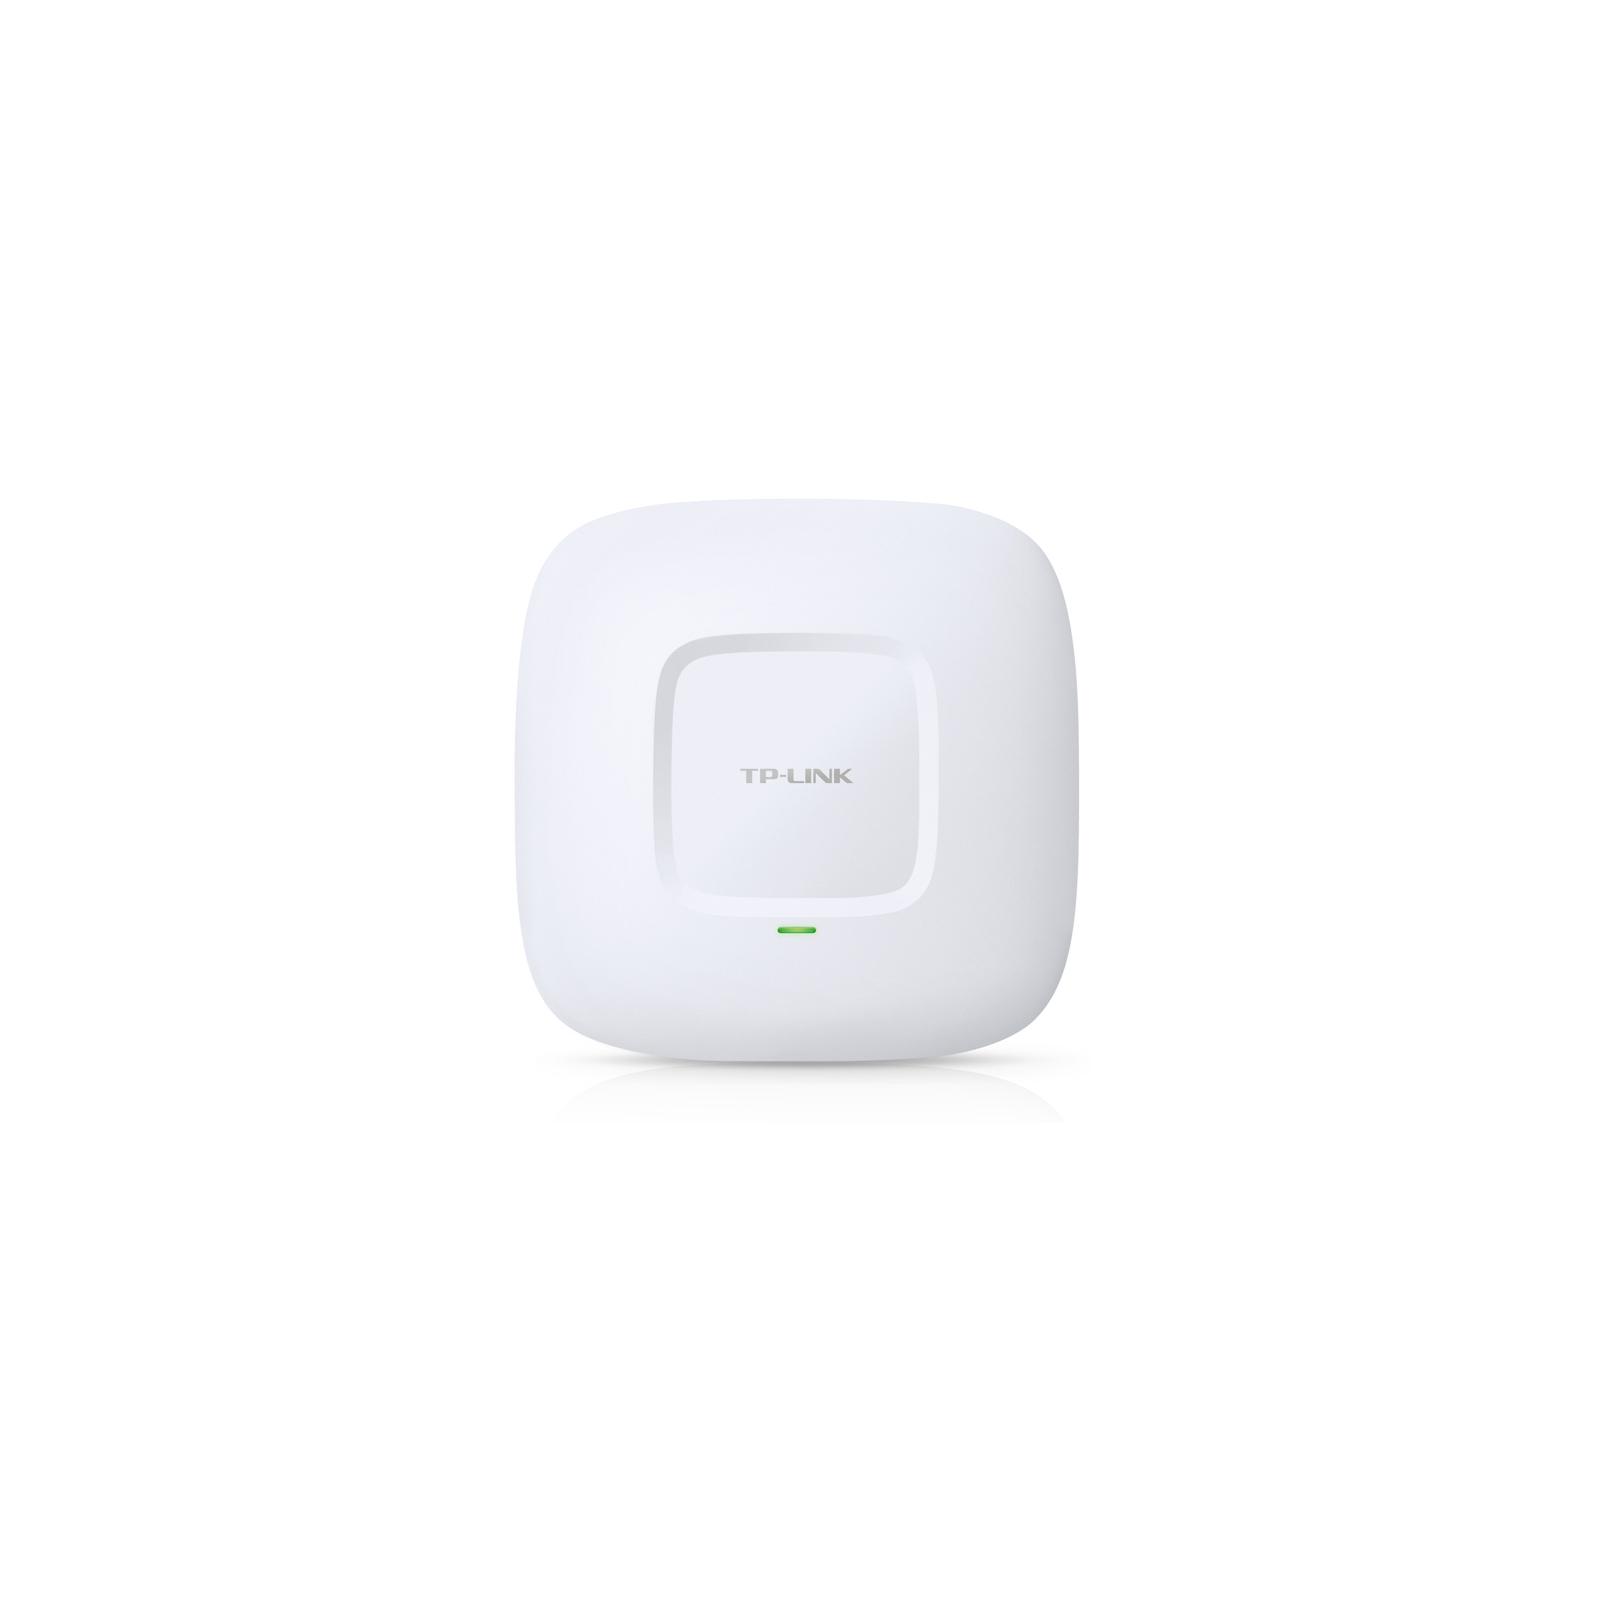 Точка доступа Wi-Fi TP-Link EAP220 изображение 2